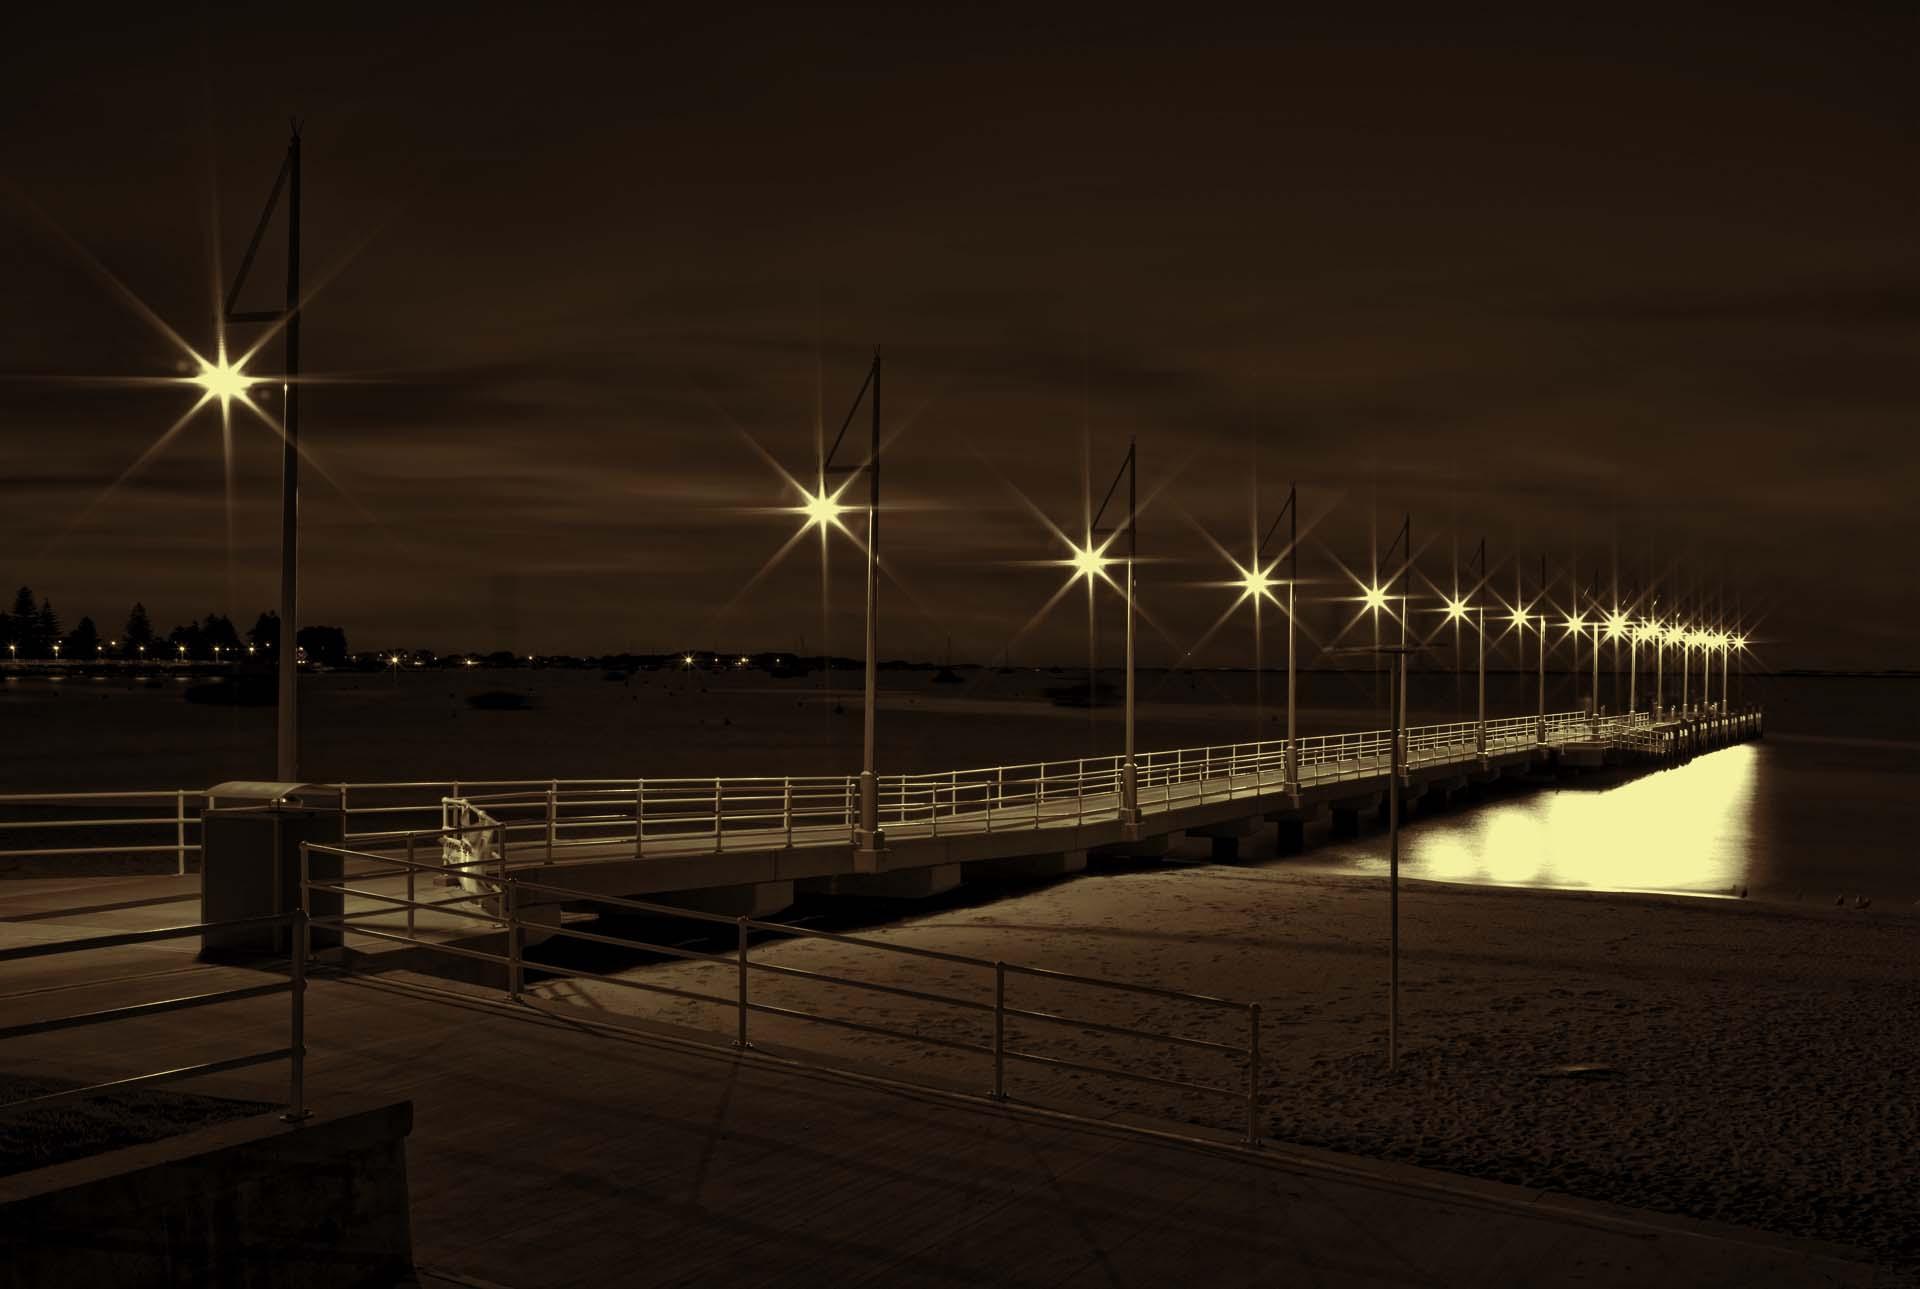 Rockingham at night